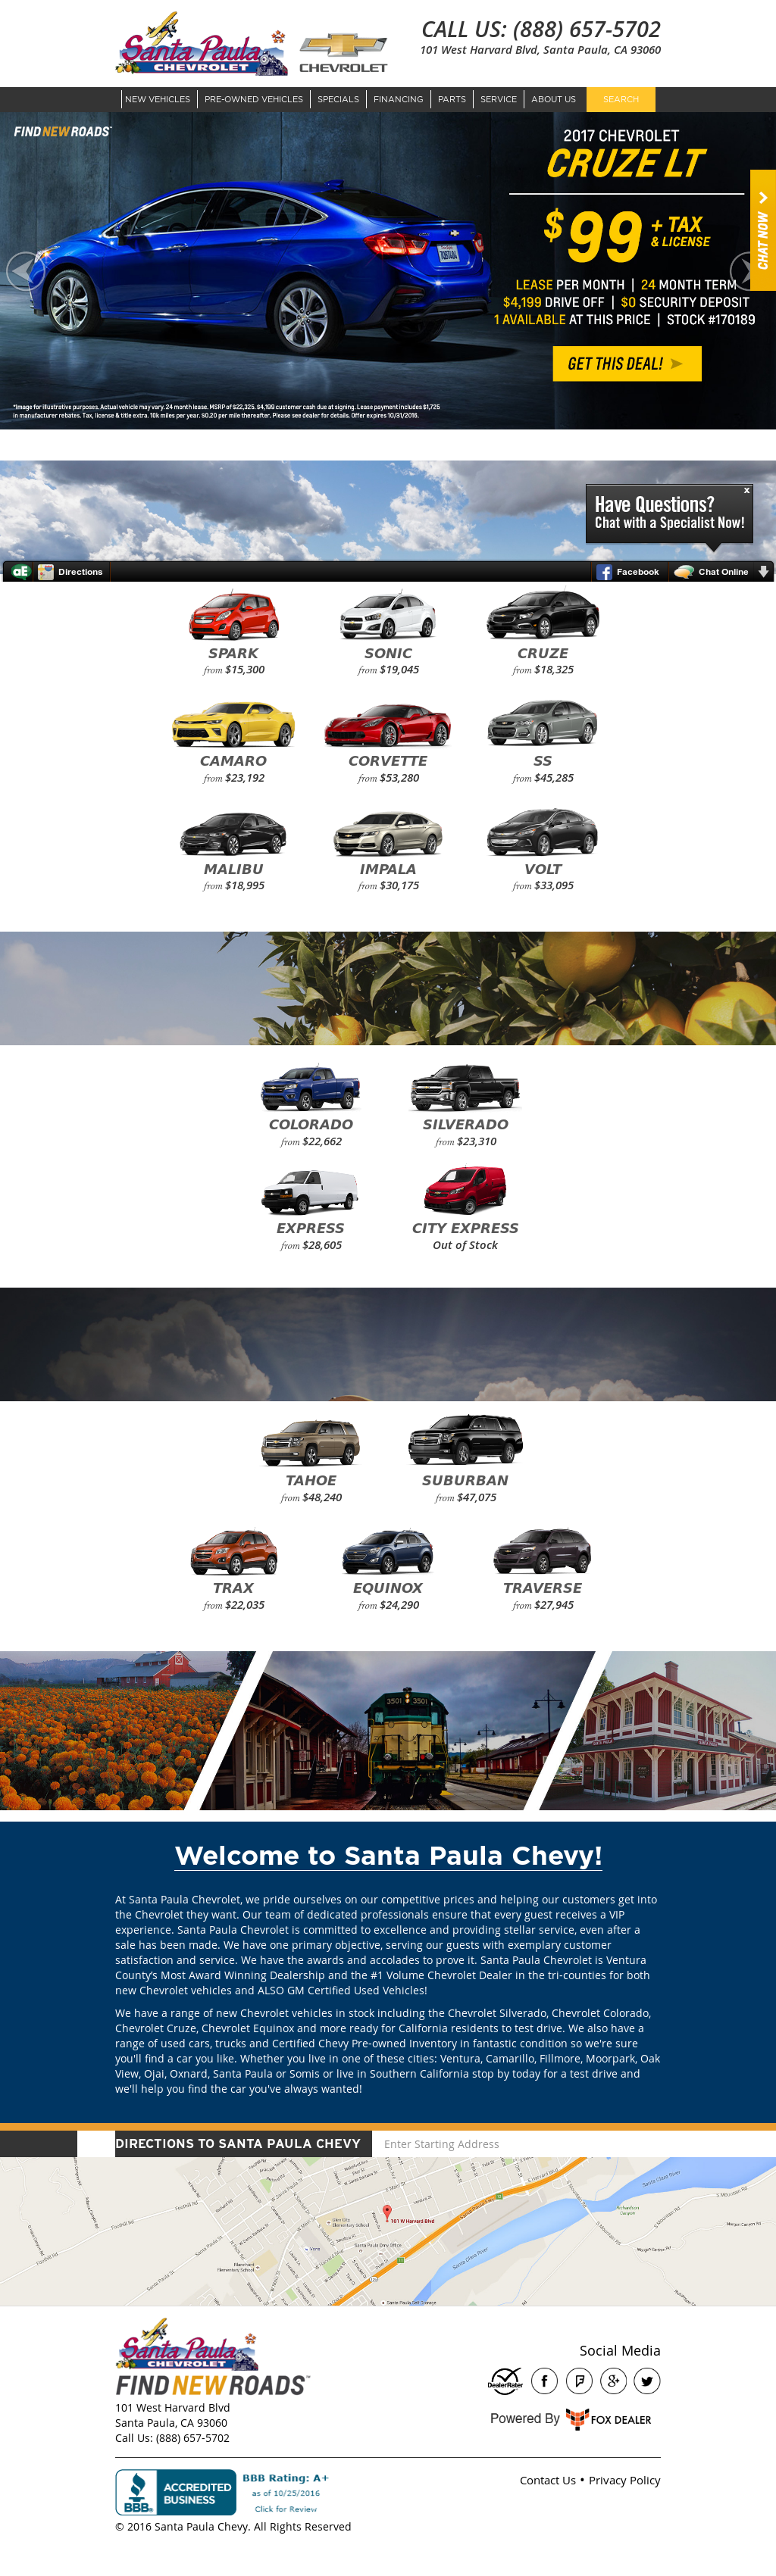 Santa Paula Chevy >> Santa Paula Chevrolet Competitors Revenue And Employees